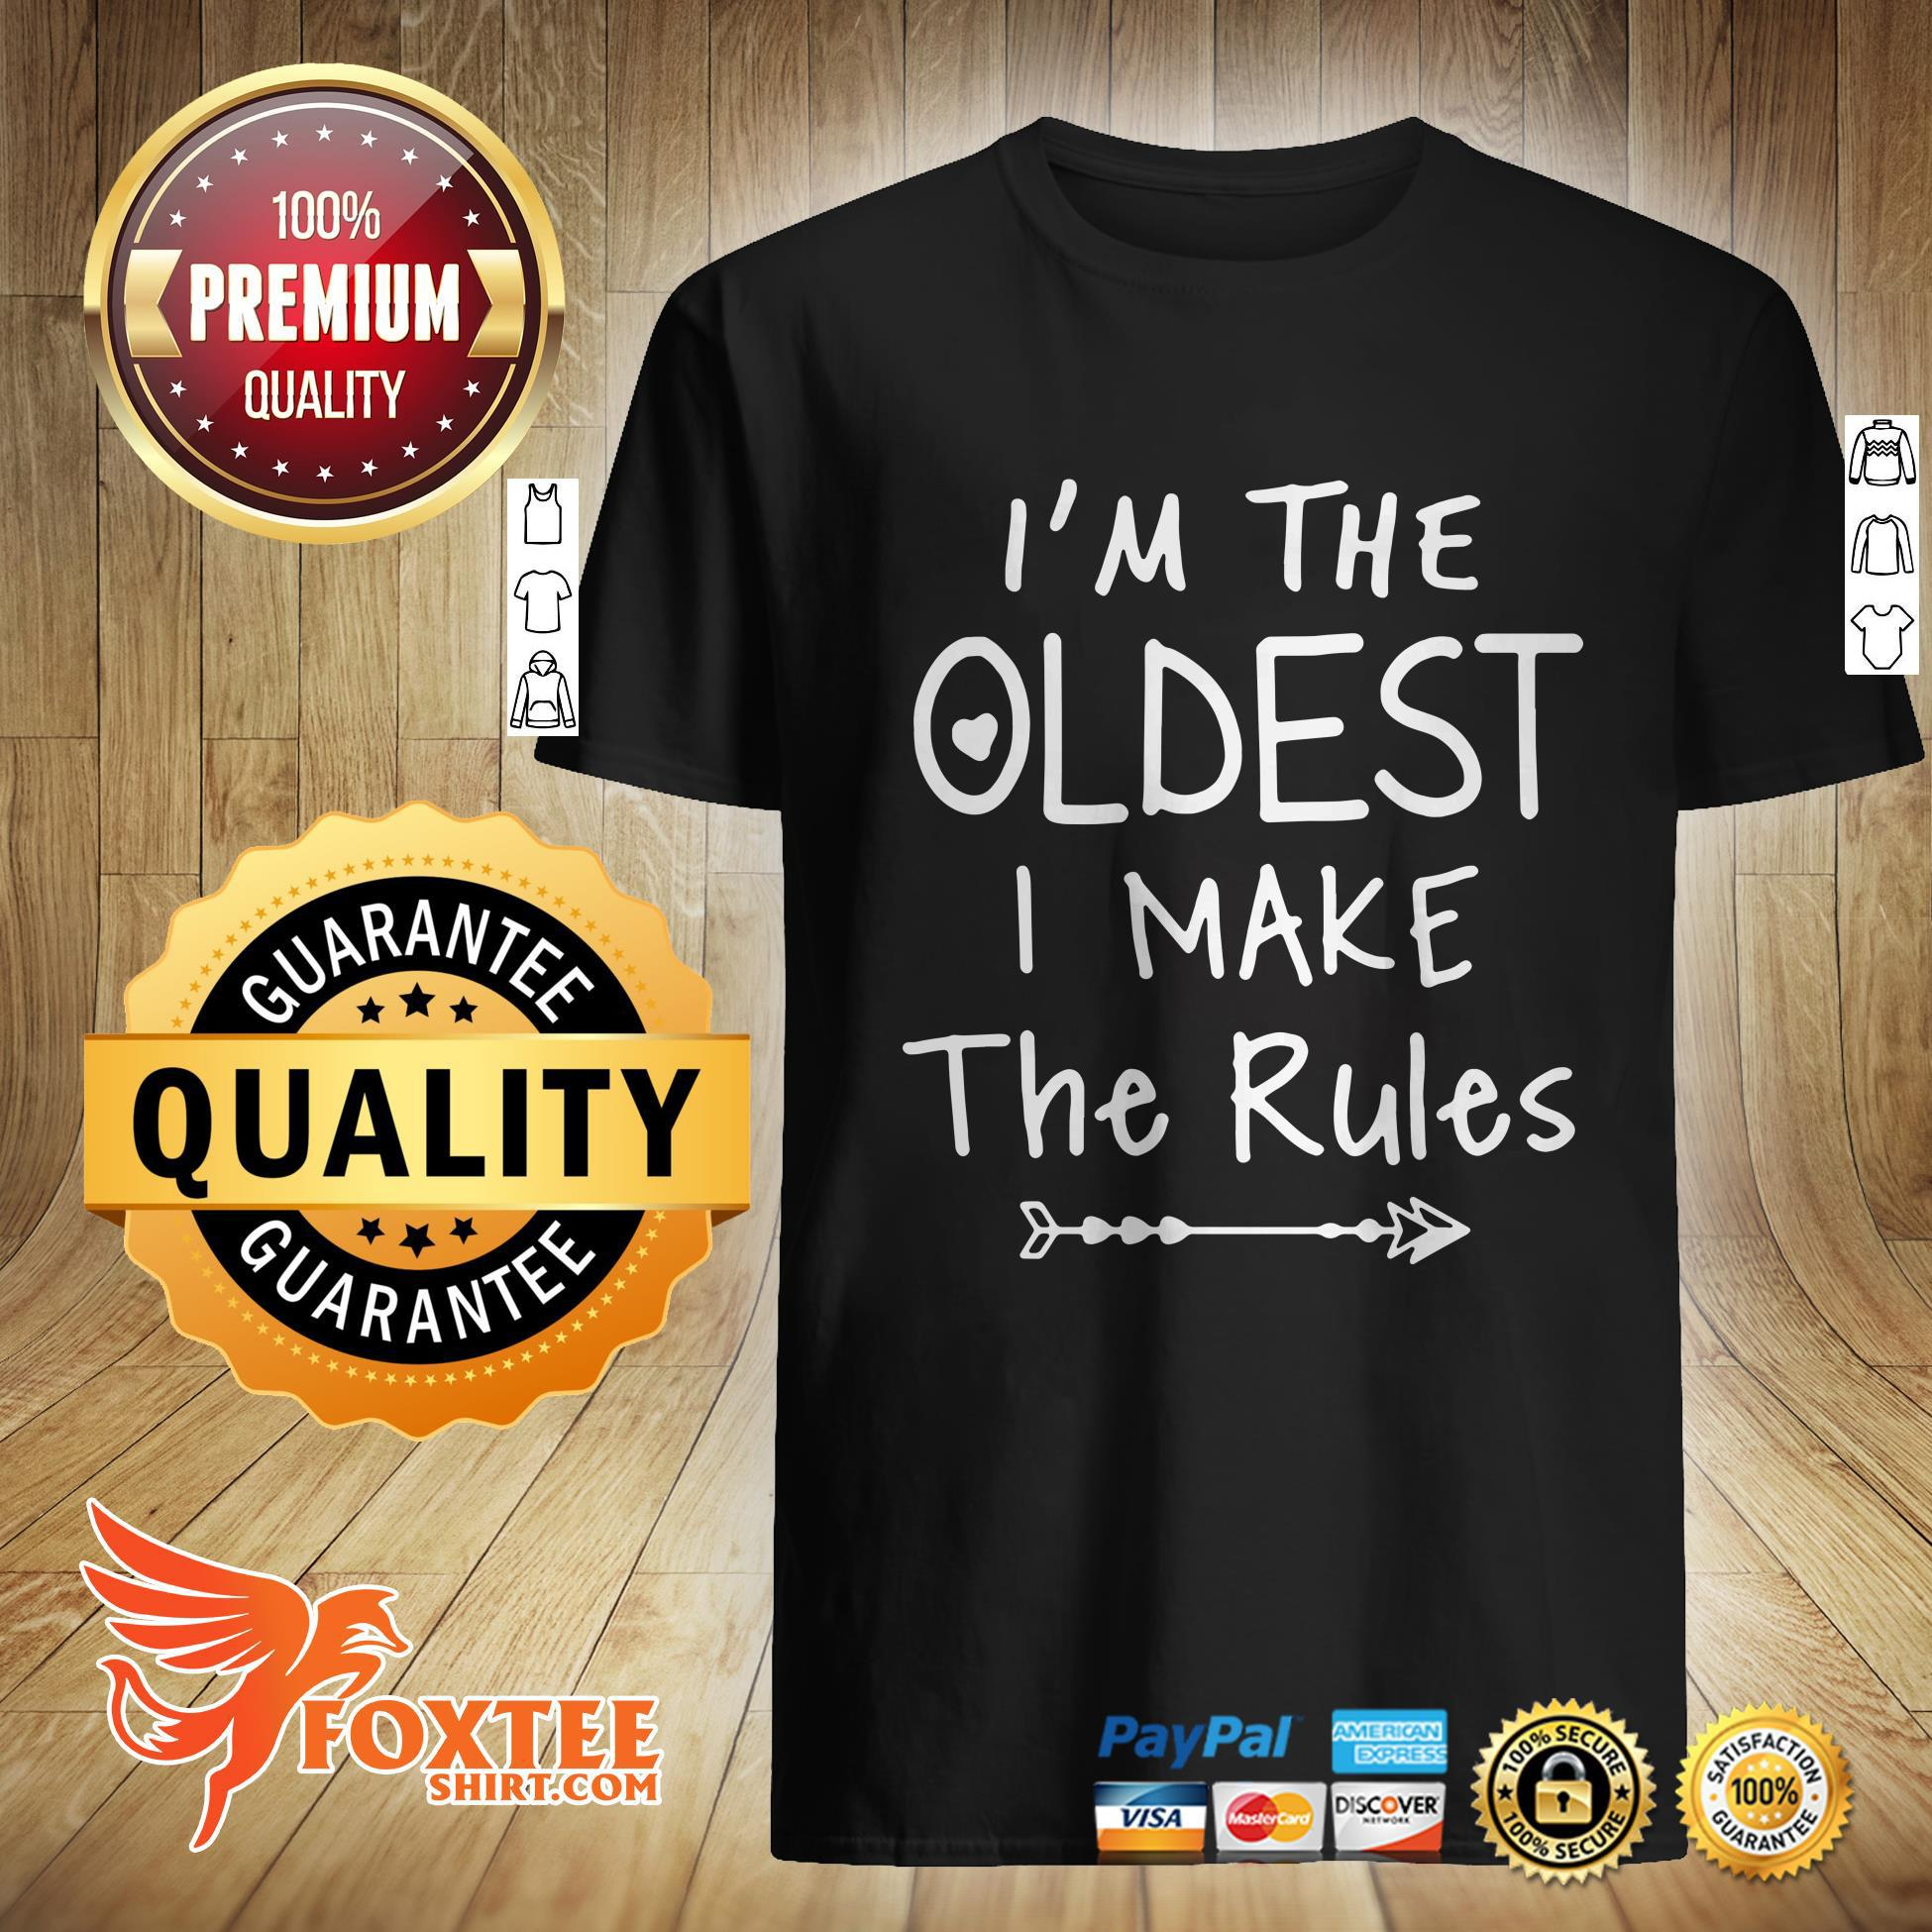 I'm The Oldest I Make The Rules Shirt